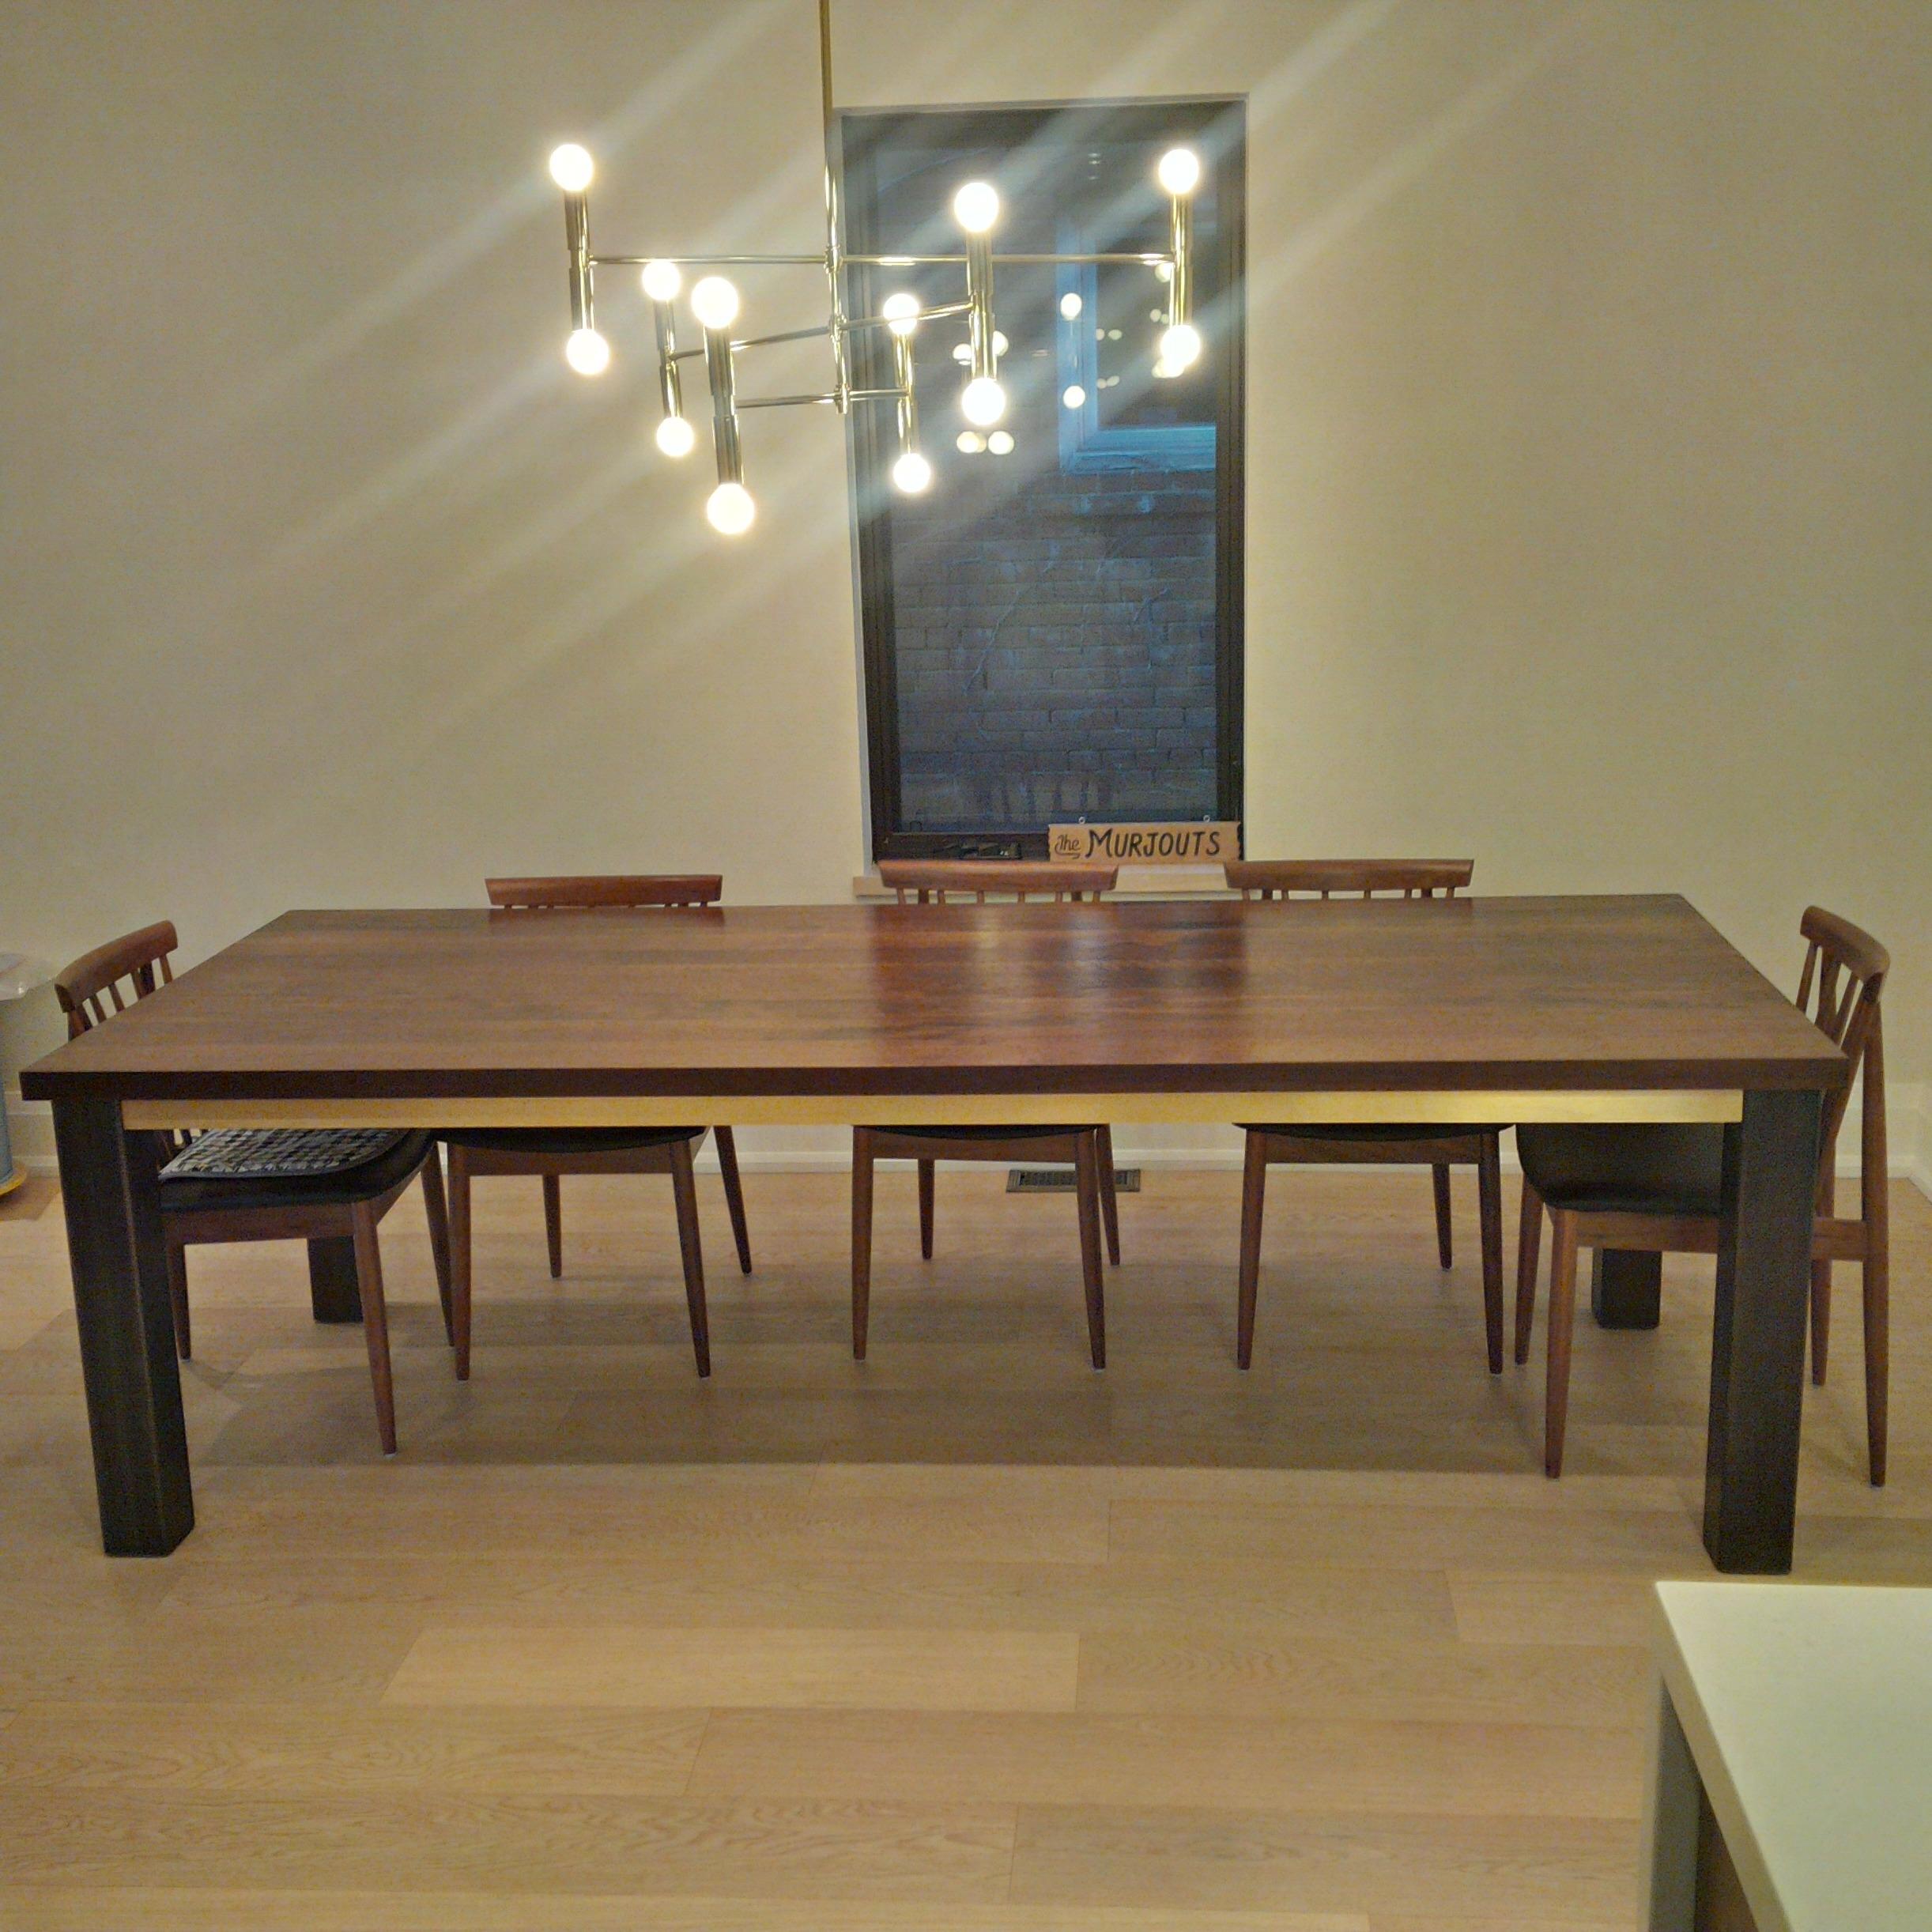 ferina's table.jpg